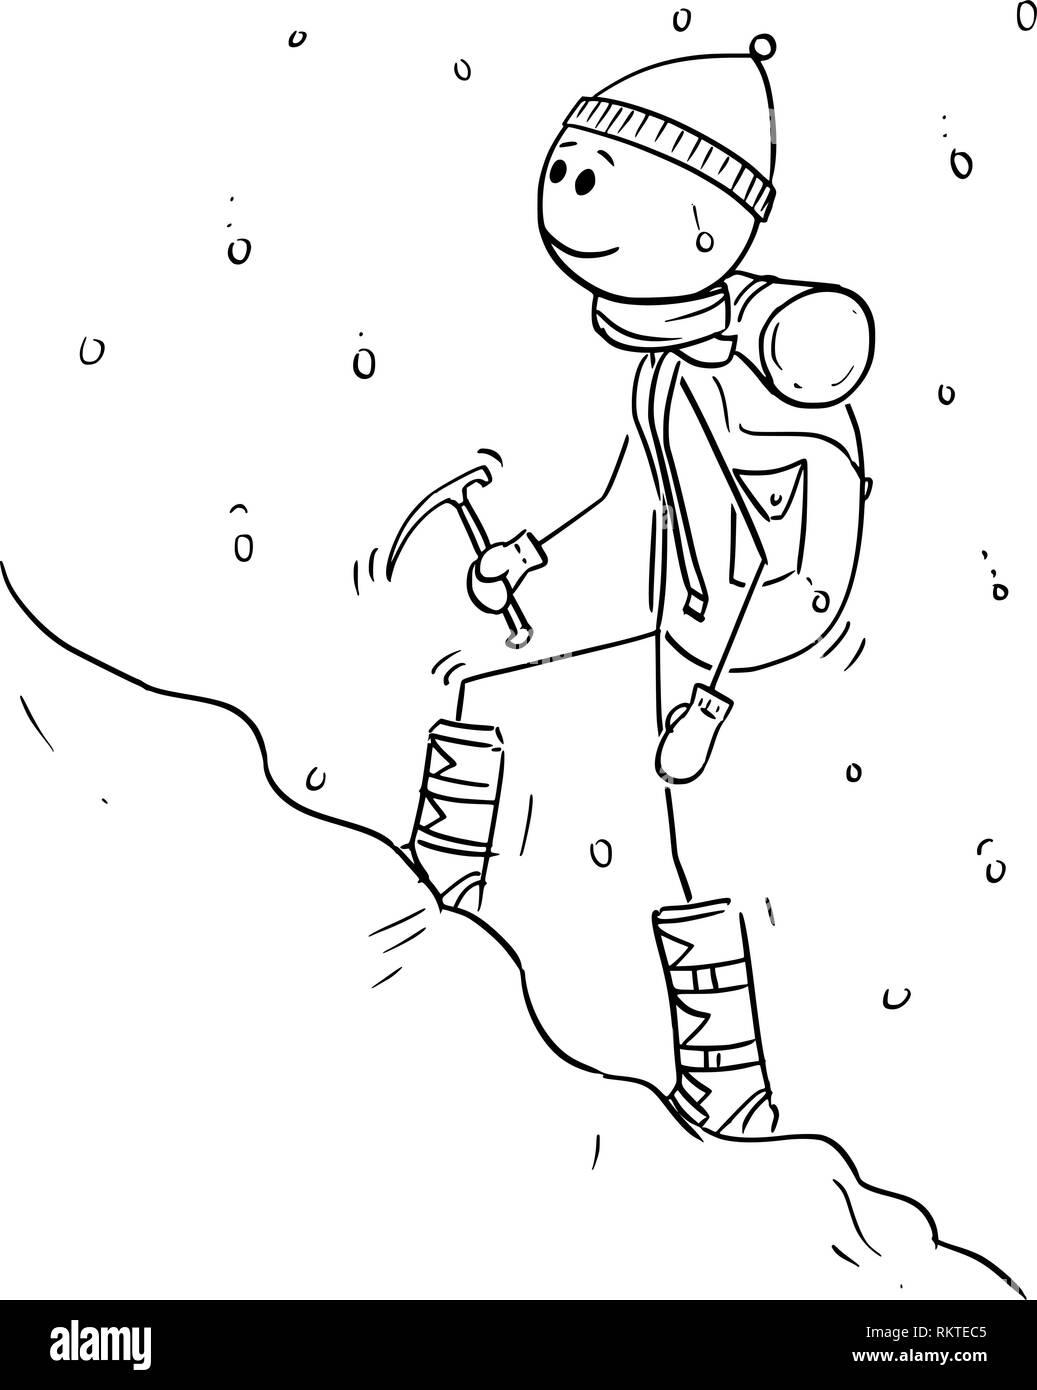 climb mountain snow black and white stock photos images alamy Mount McKinley Alaska cartoon drawing of mountaineer or alpinist walking through snow stock image